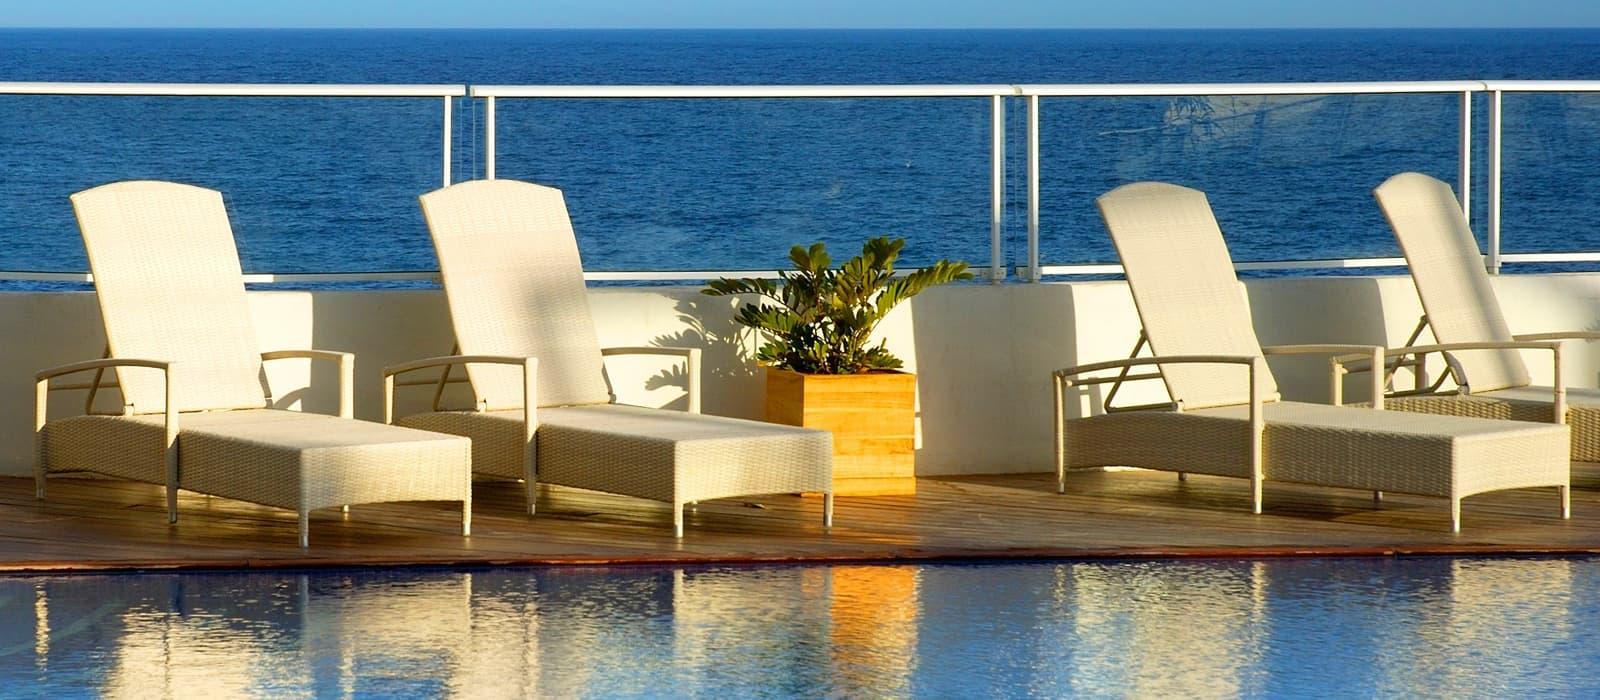 Hotel Tenerife Golf - Vincci Hoteles